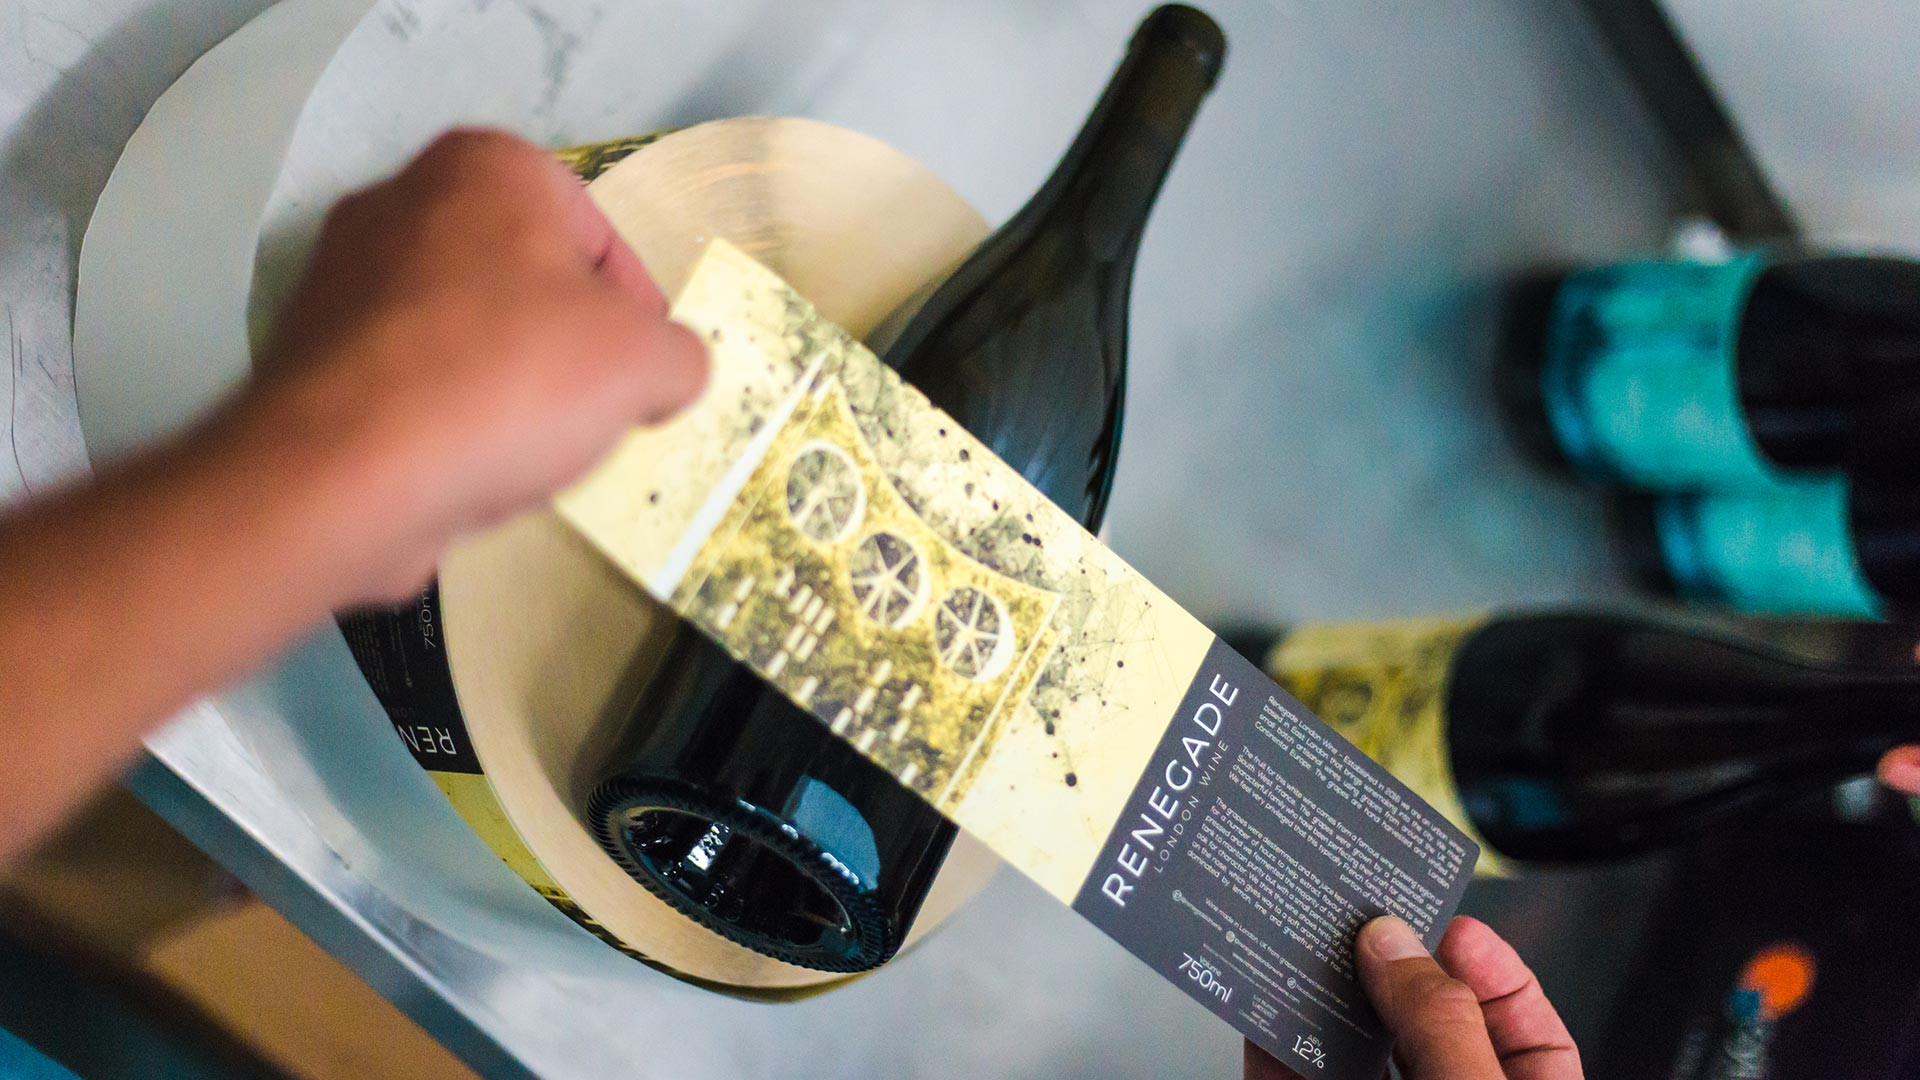 SAUVIGNON BLANC by Renegade London Wine